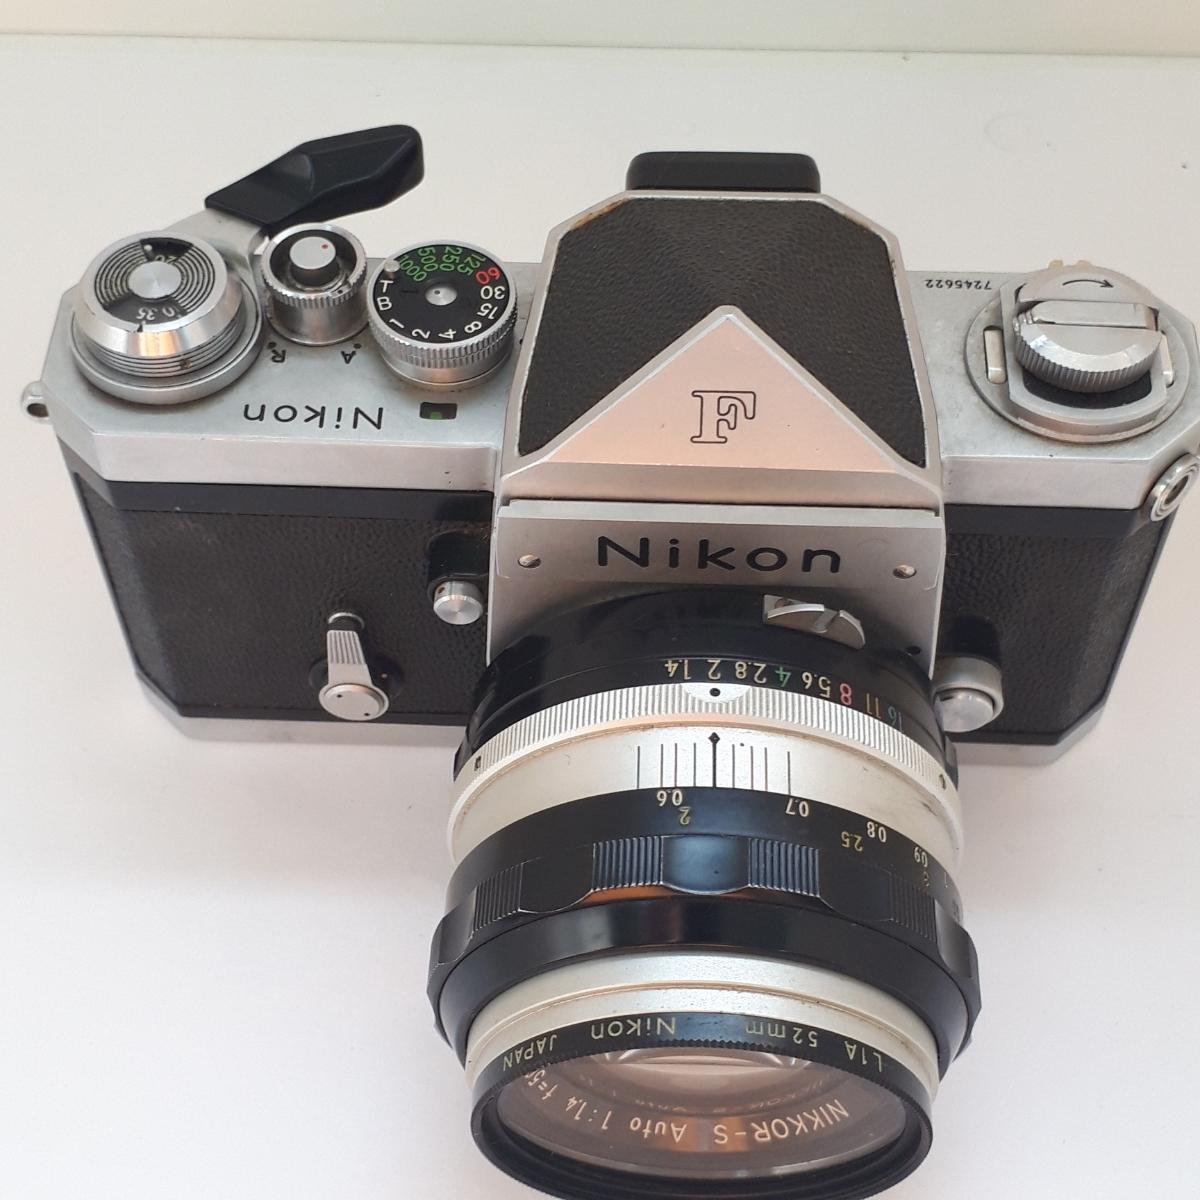 ★NIKON ニコン F NIKKOR-S 1:1.4 50mm 一眼レフカメラ レンズ★_画像5